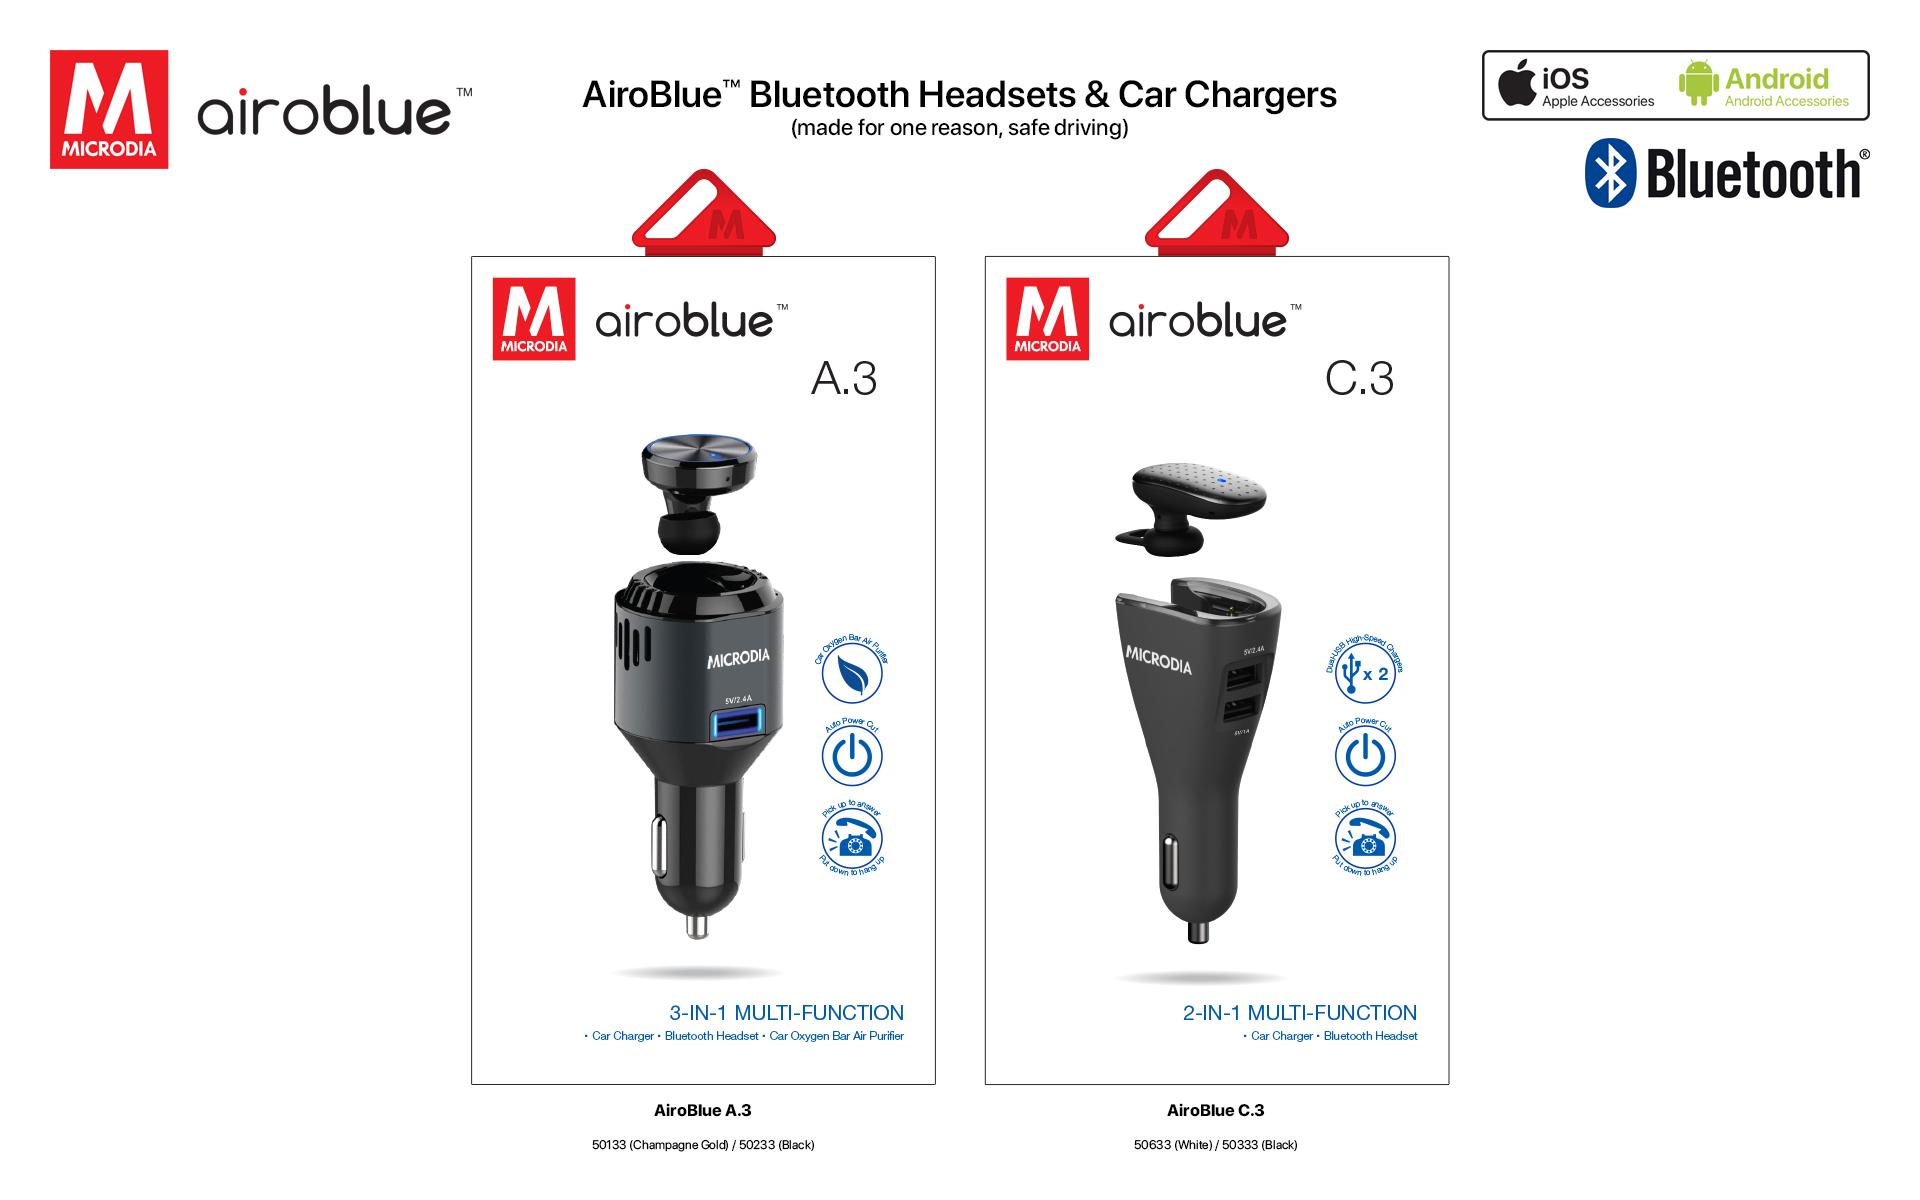 7. Airoblue Bluetooth Headset